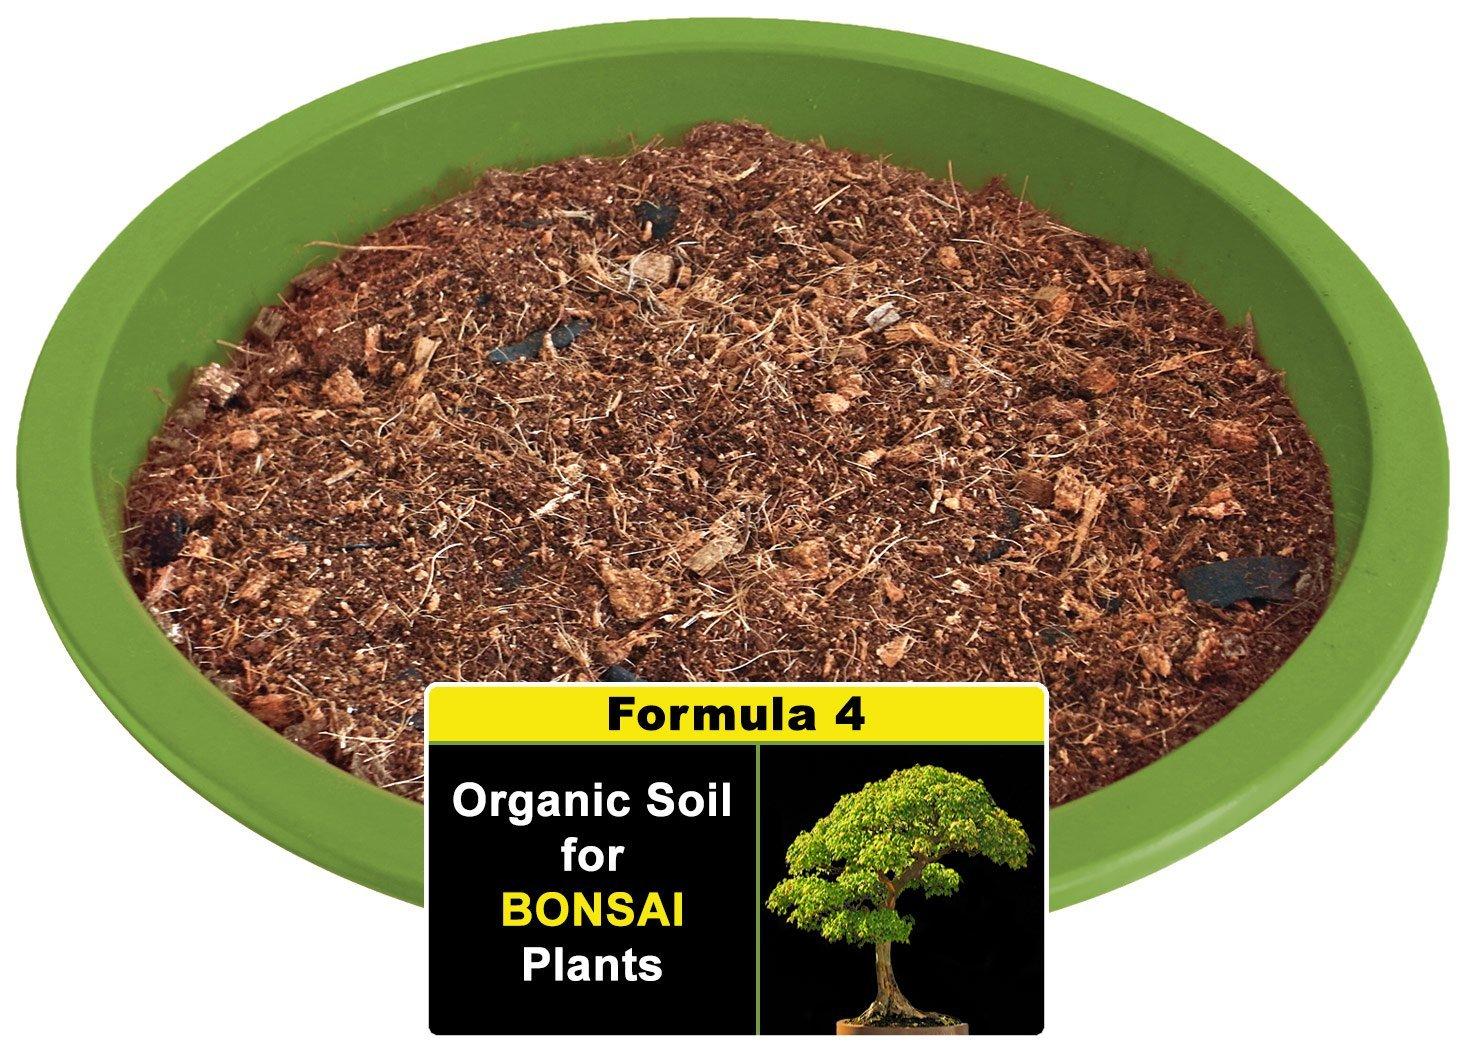 Smiling Worm 5 Quarts Bonsai Soil With Charcoal Olive Tree Chinese Elm Wisteria Sakura